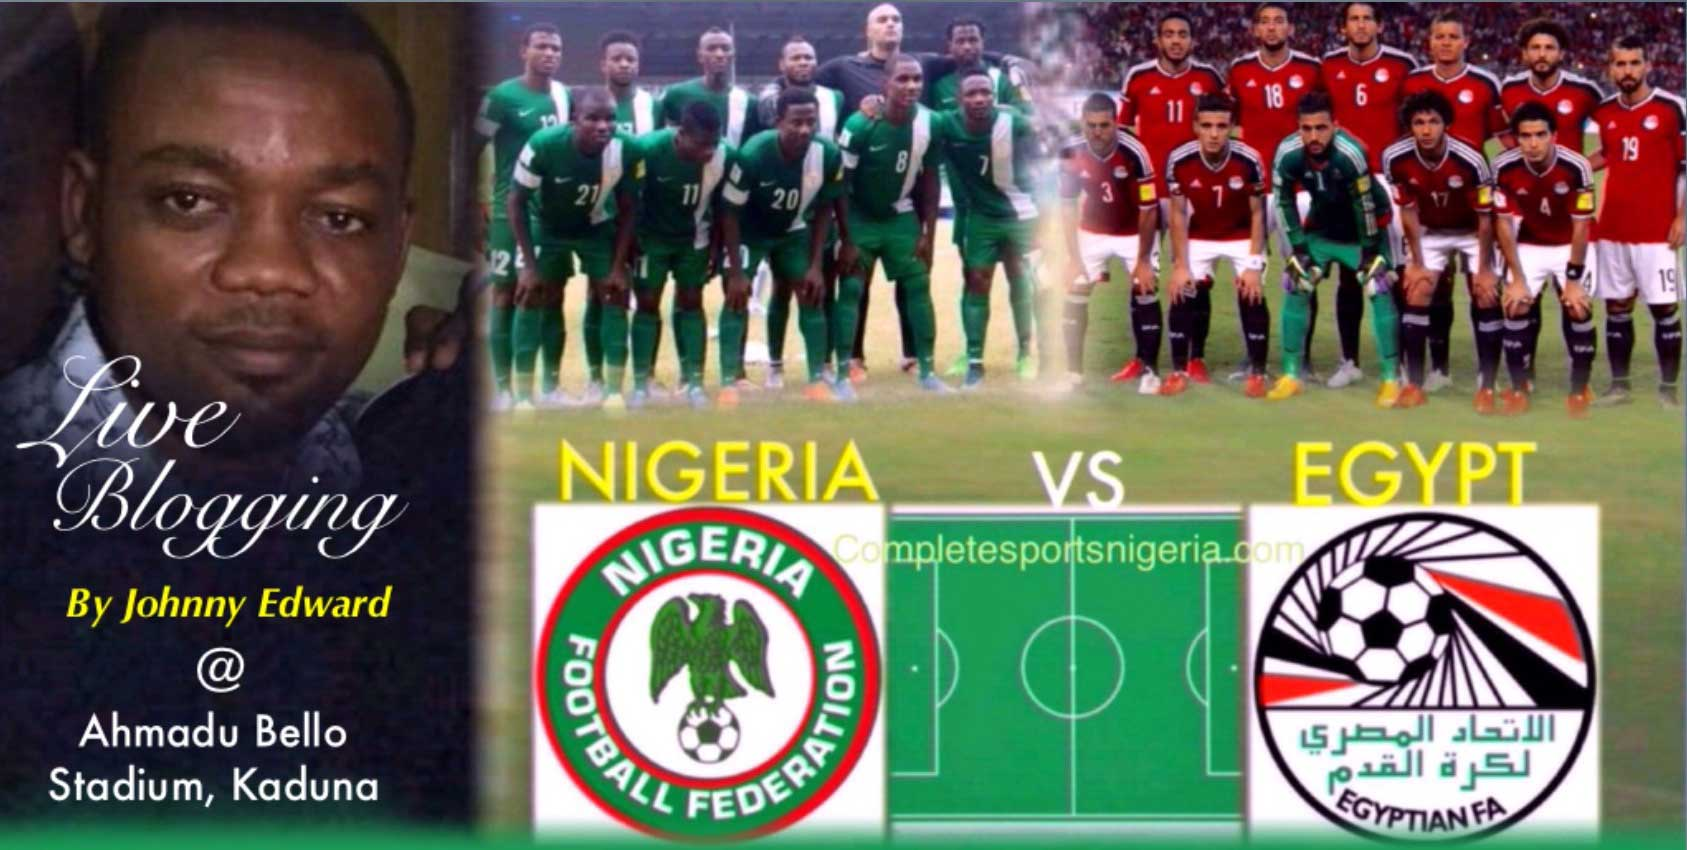 Nigeria vs Egypt: Minute by Minute Live Blogging